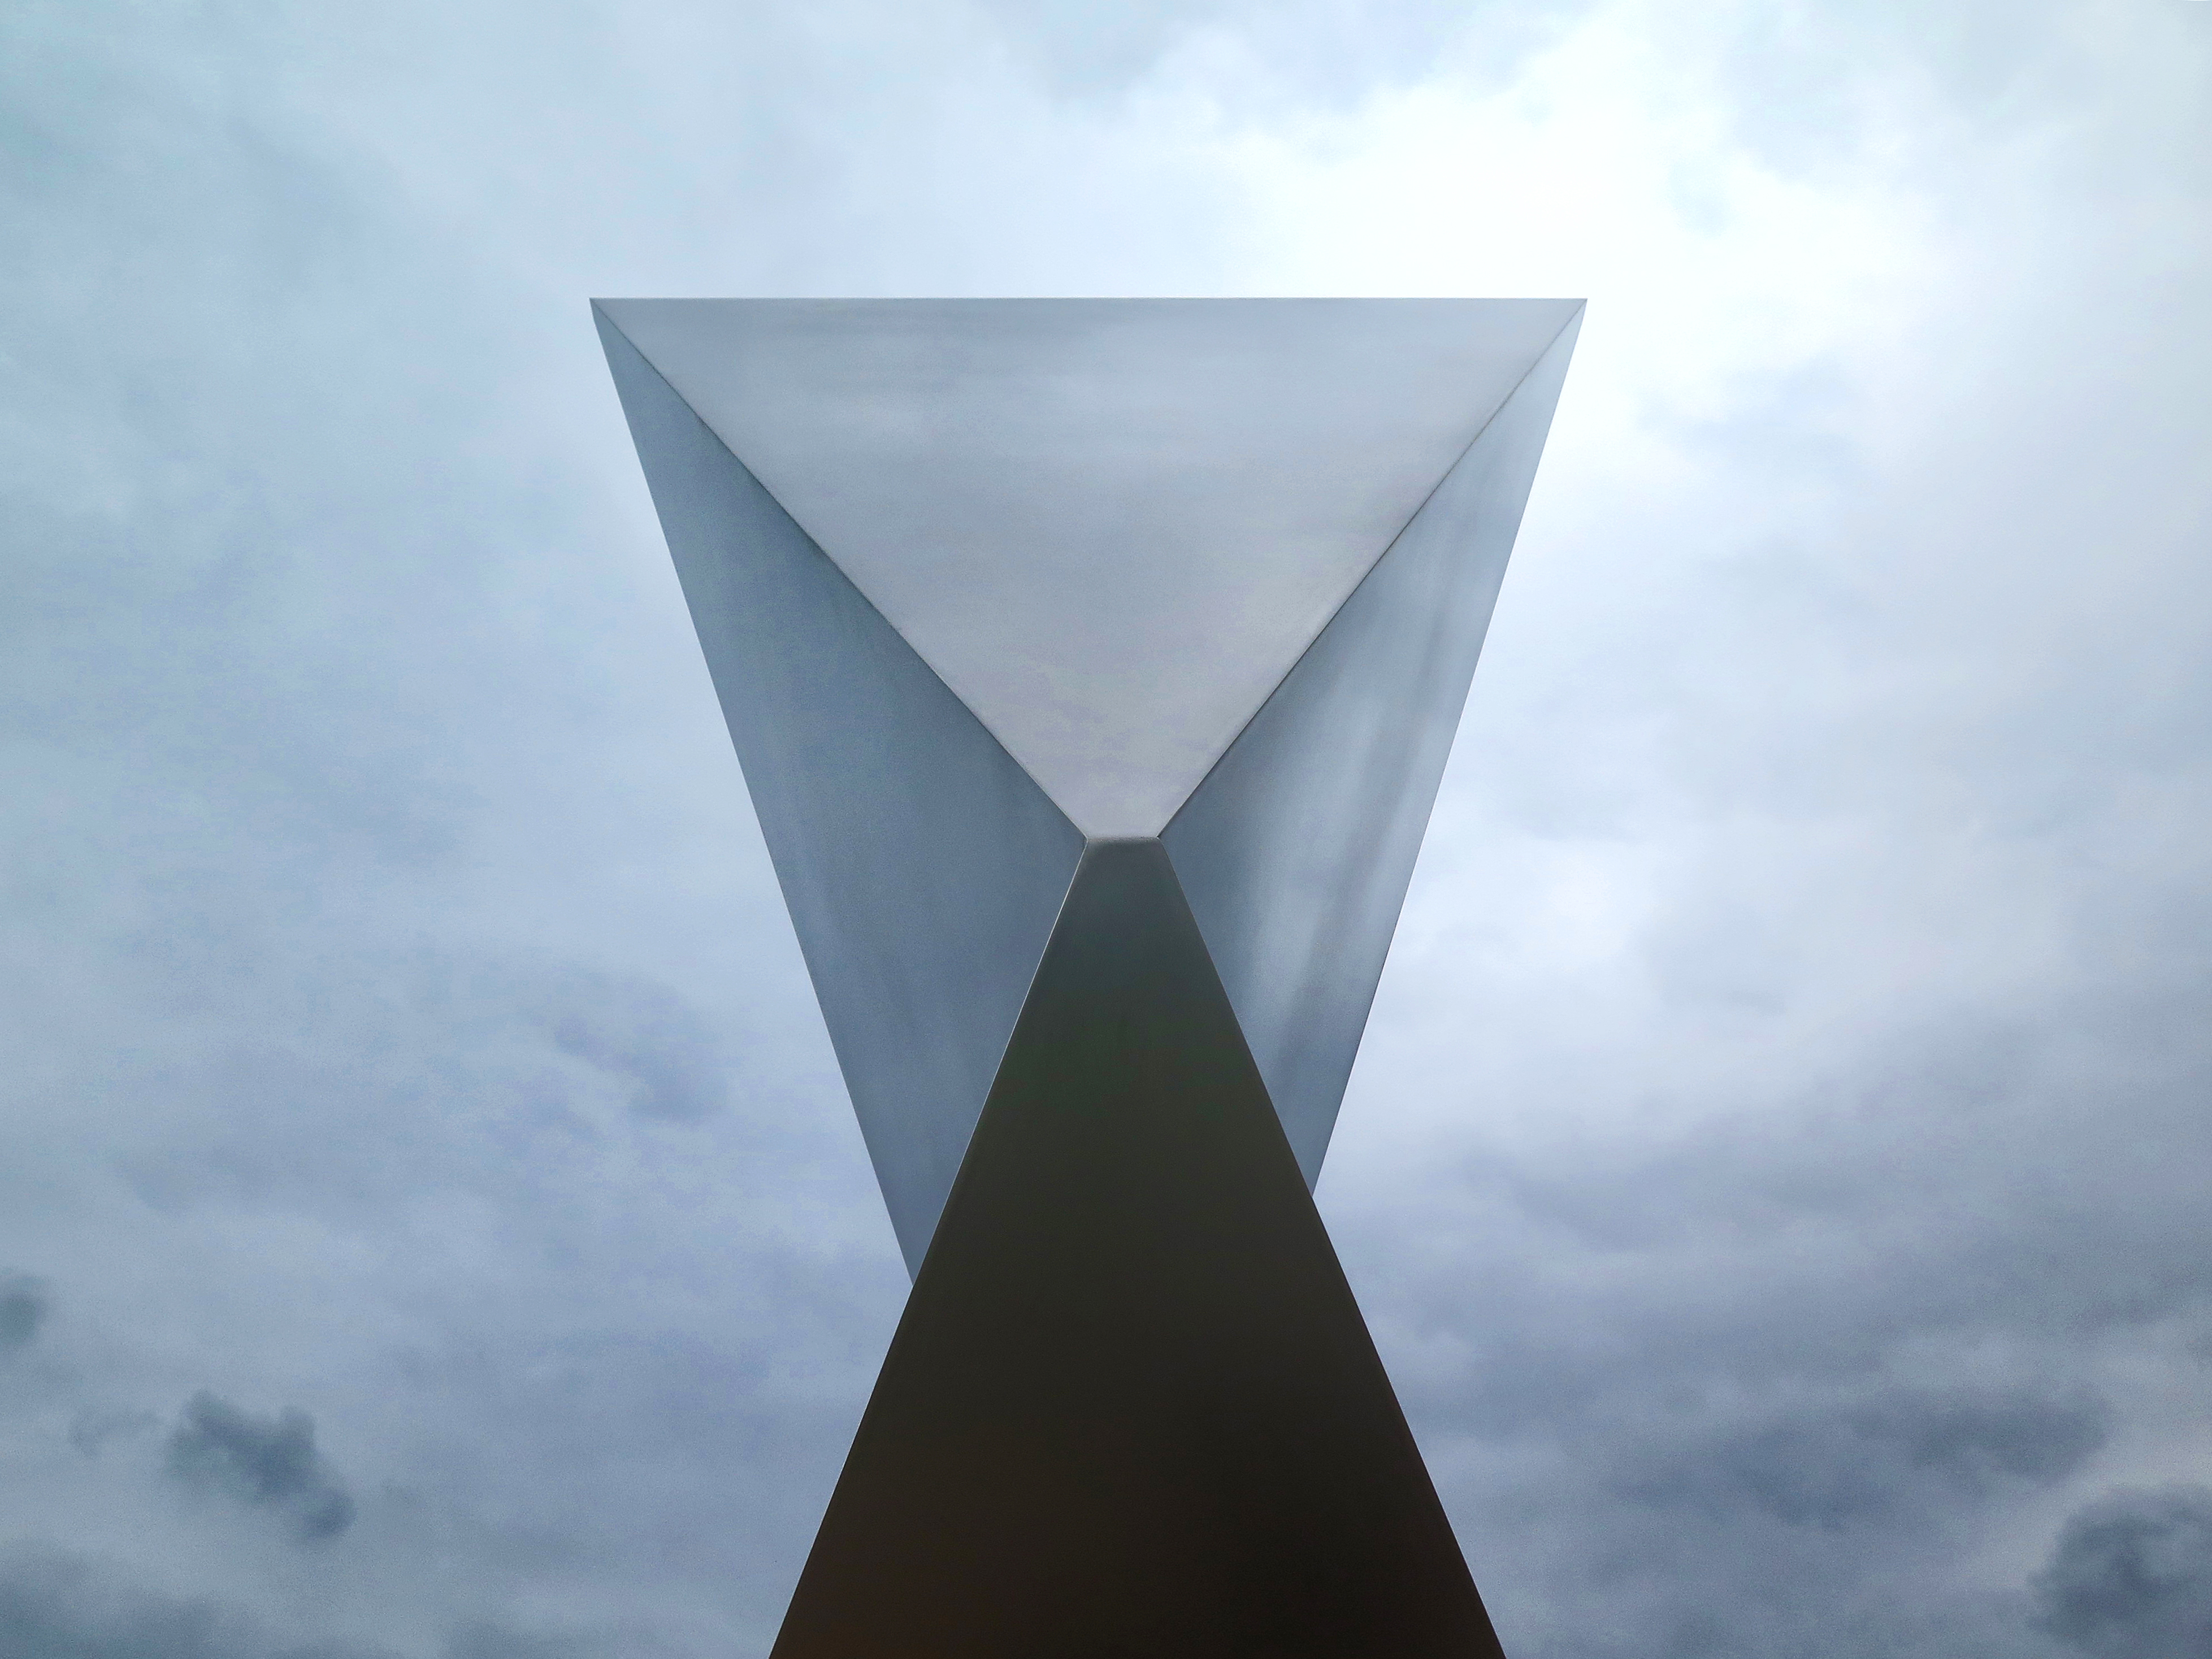 Tetra Pak Skulptur Luigi Mule Hochheim